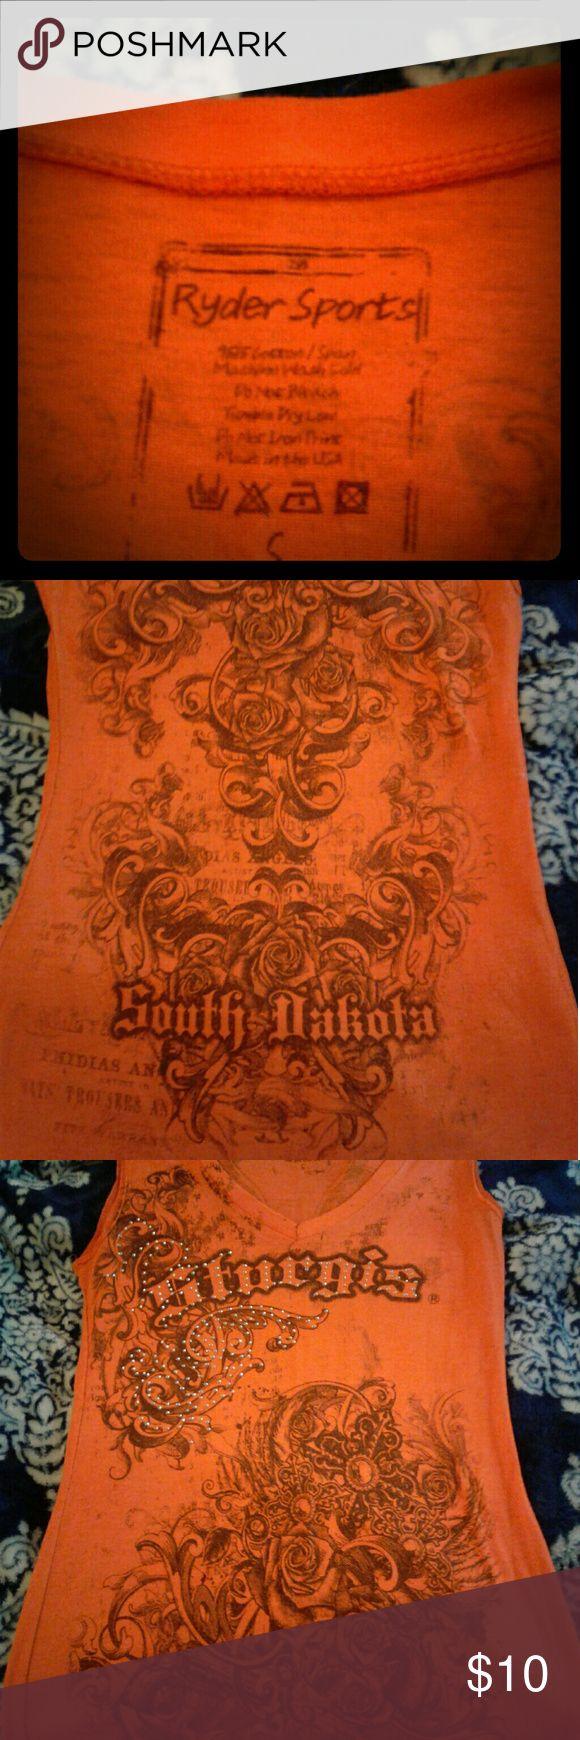 2013 sturgis south Dakota shirt 2013 sturgis south dakota bike rally shirt ryder sports Tops Tank Tops